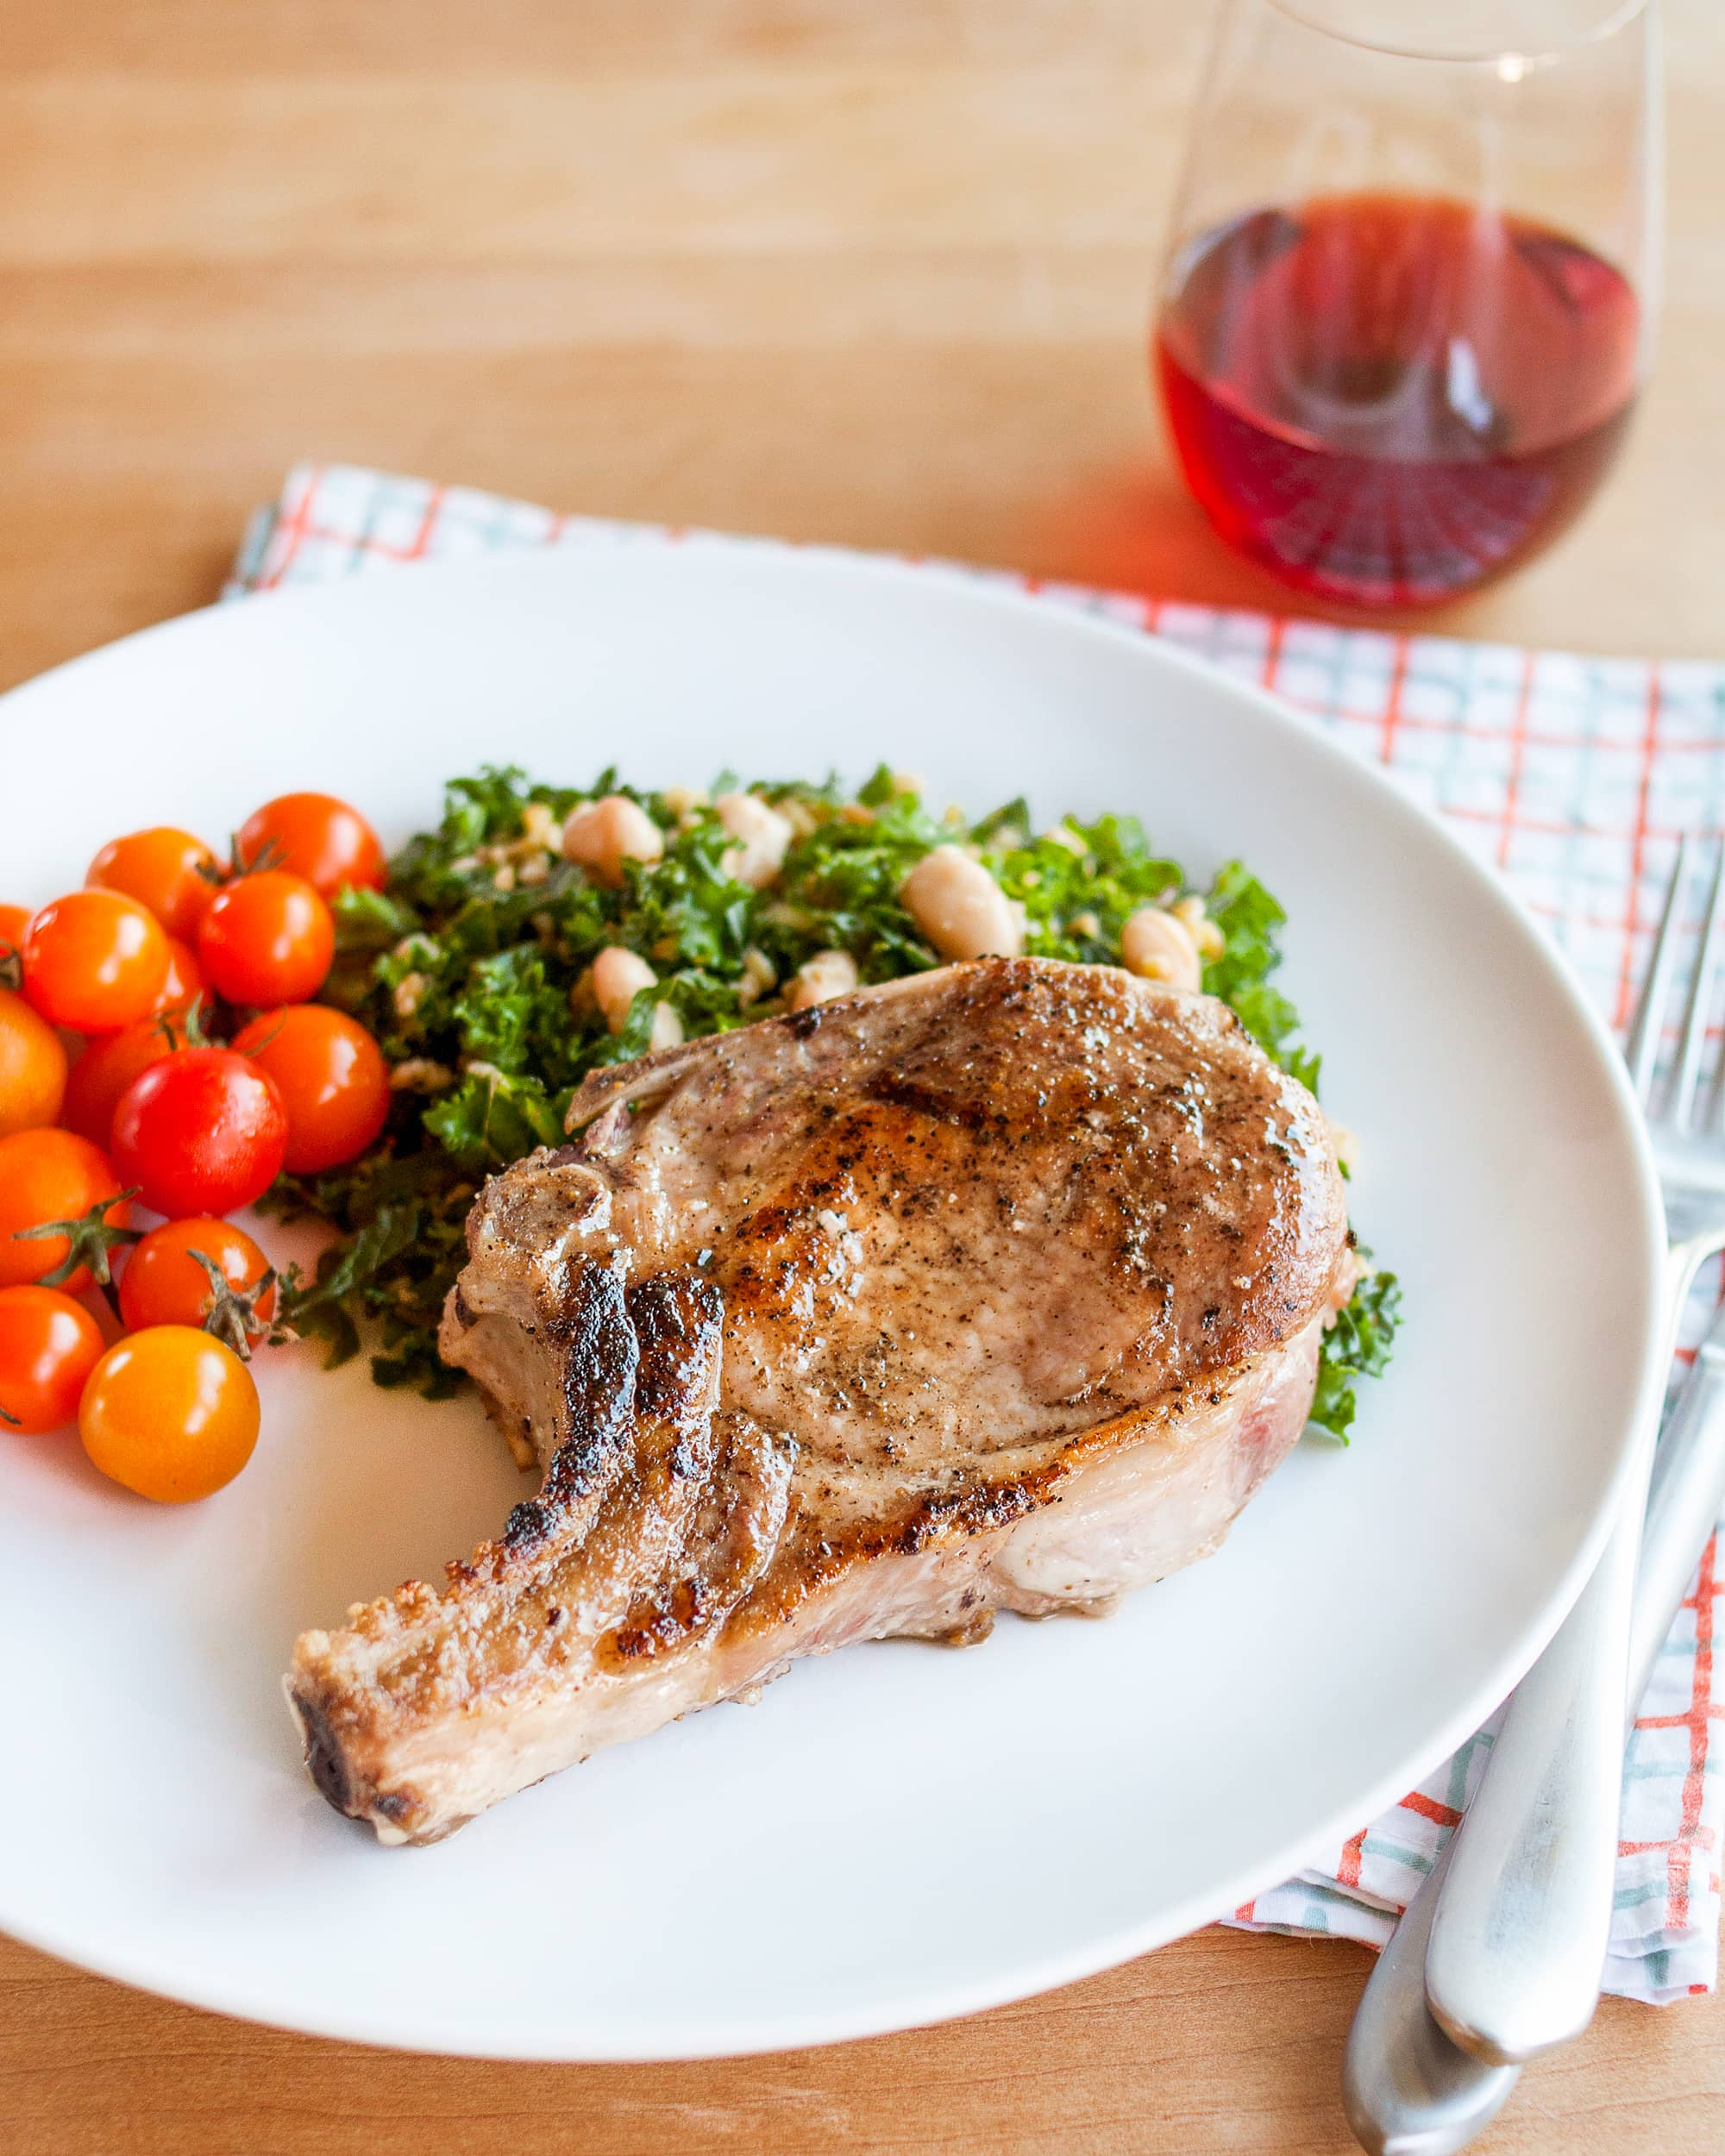 10 Popular Pork Chop Recipes to Make Right Now